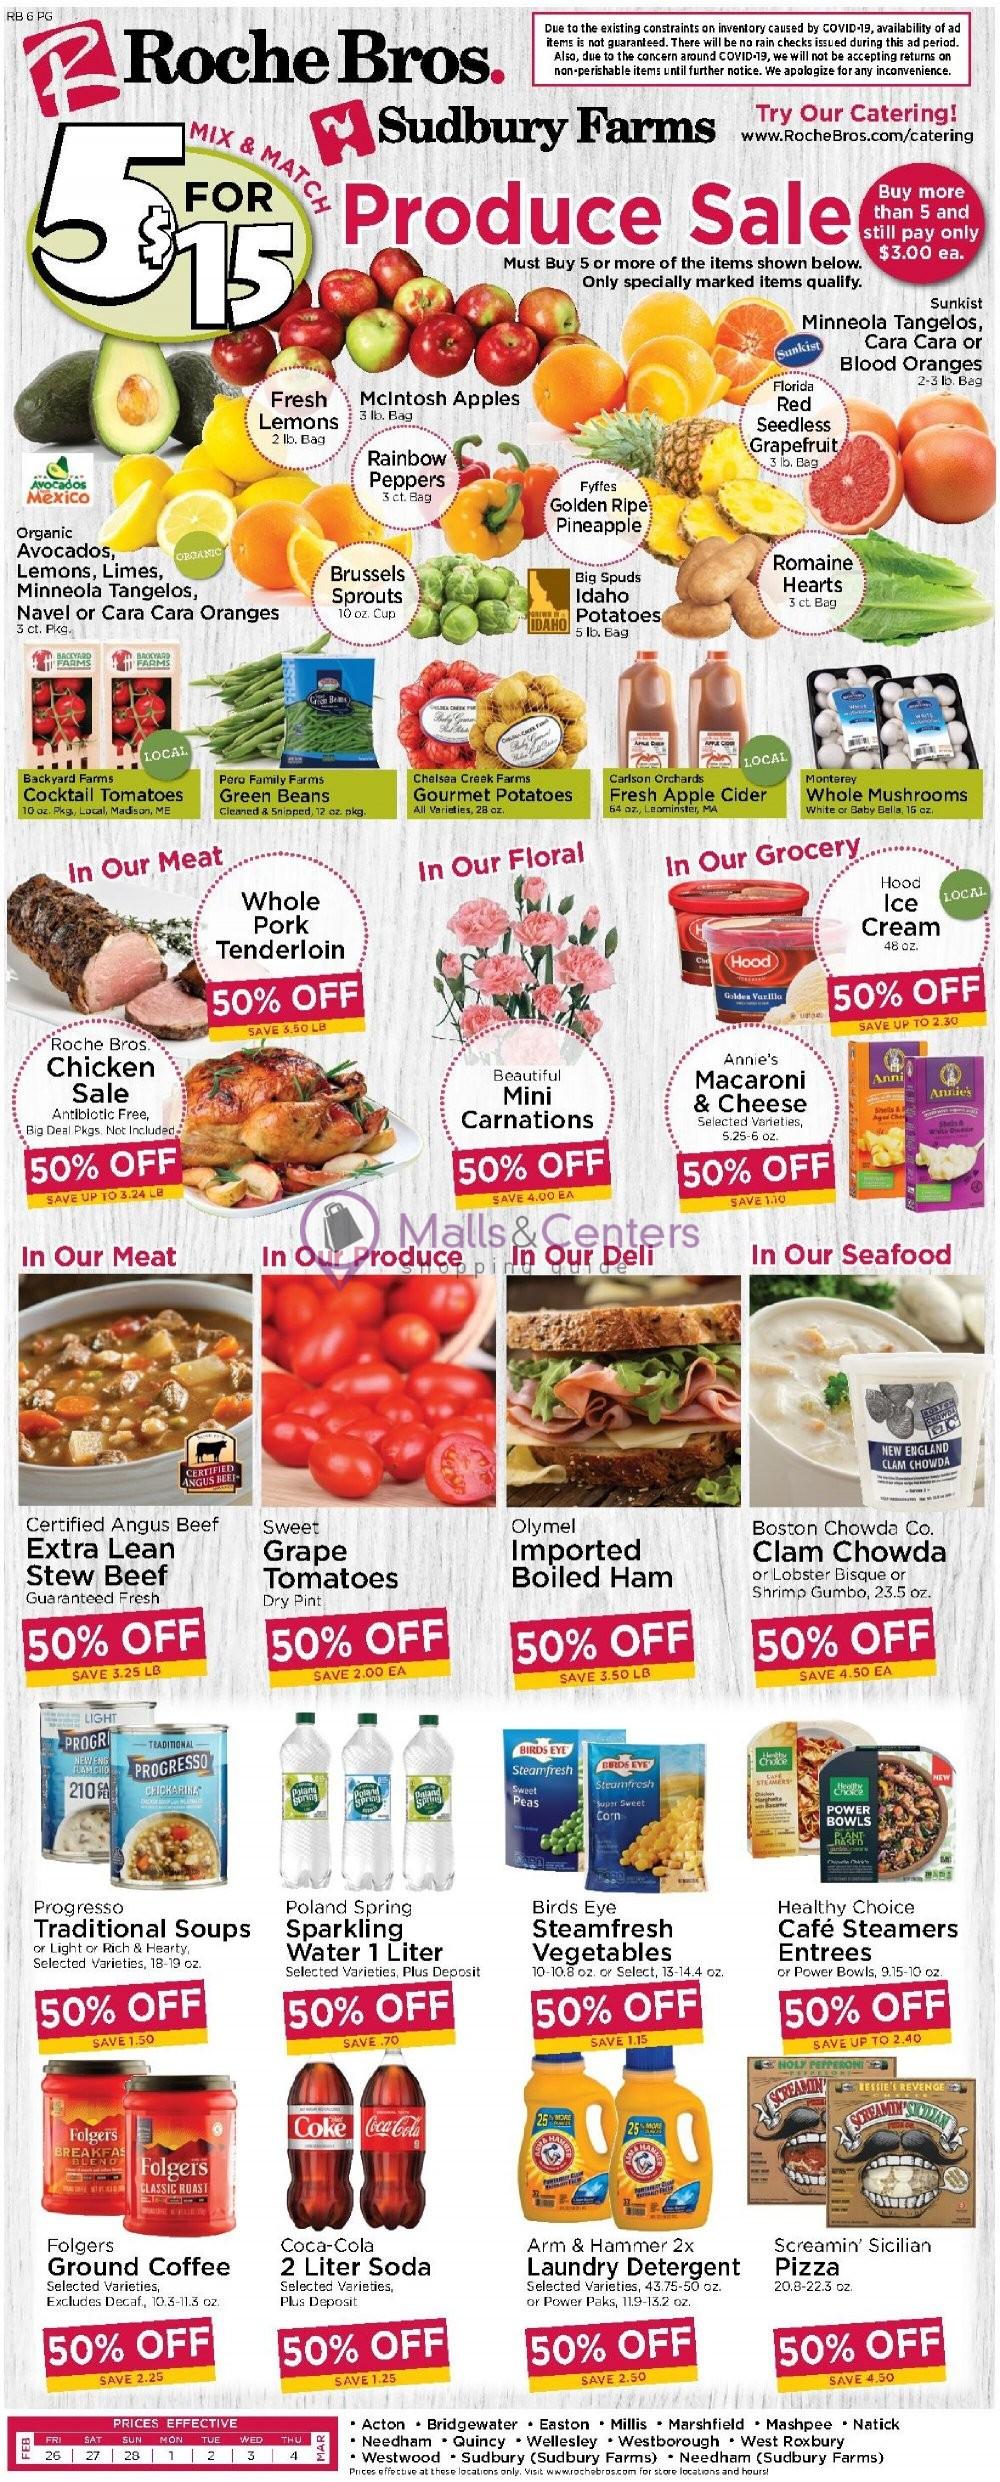 weekly ads Roche Bros. Supermarkets - page 1 - mallscenters.com